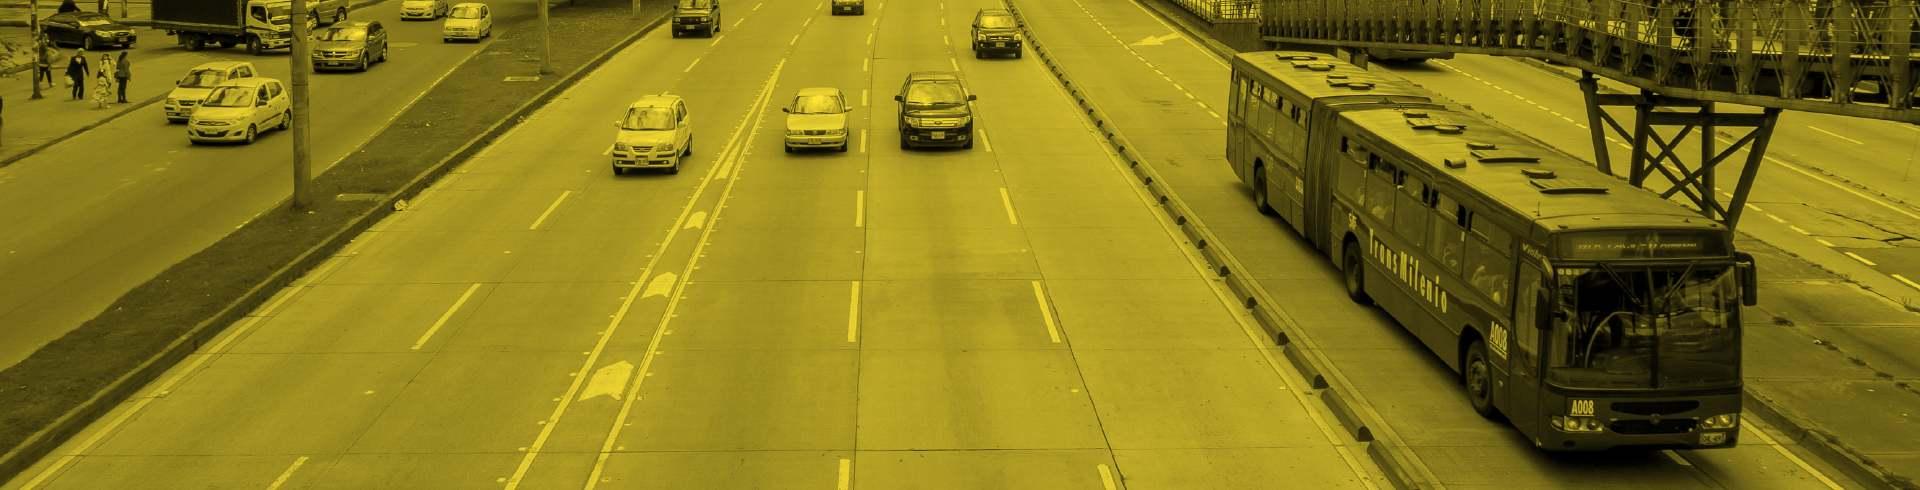 Optimización de operación de sistemas de transporte público